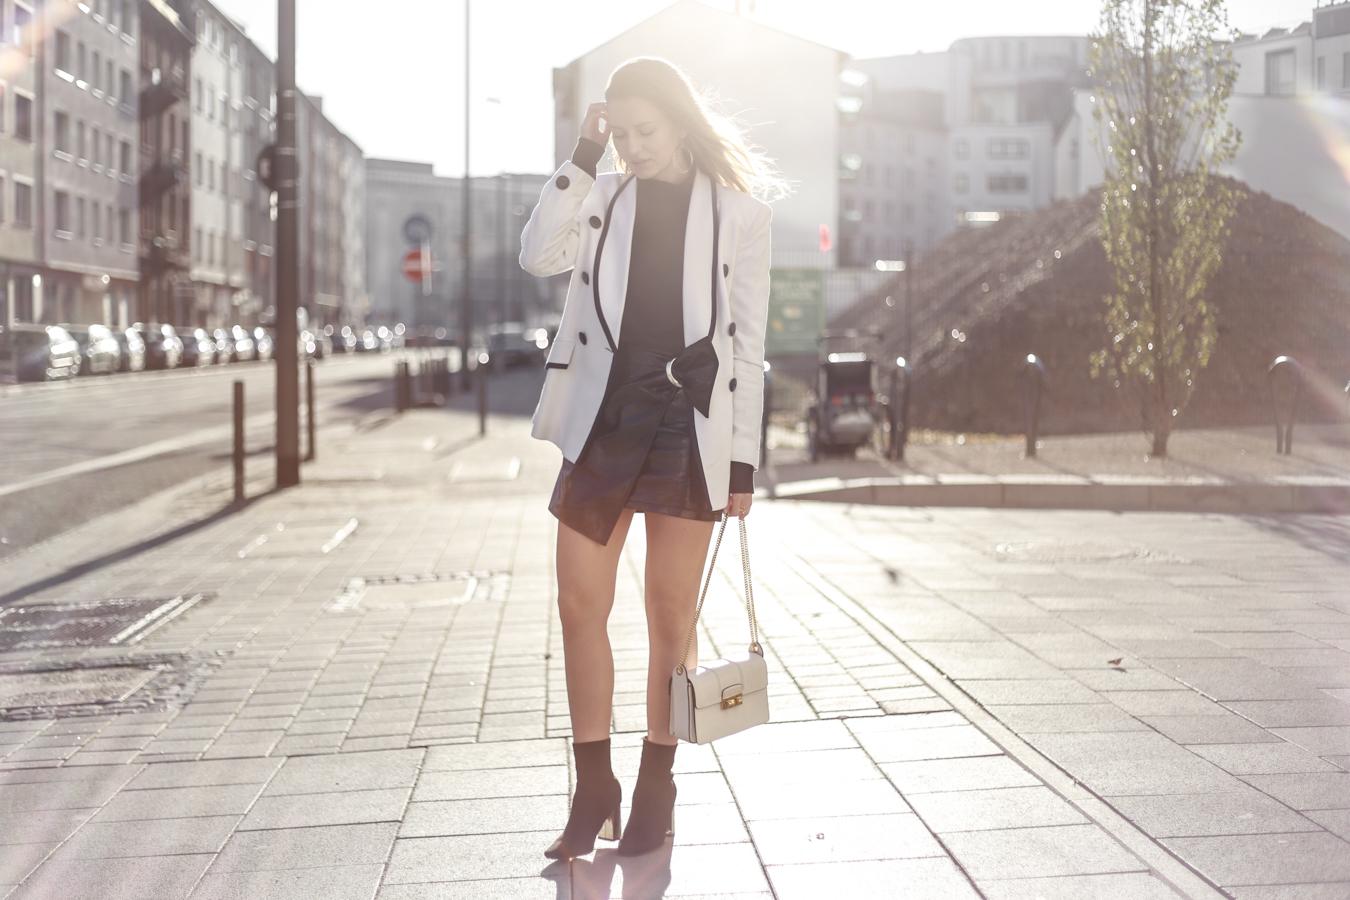 pvc-skirt-vinyl-dior-vintage-livia-auer-7487